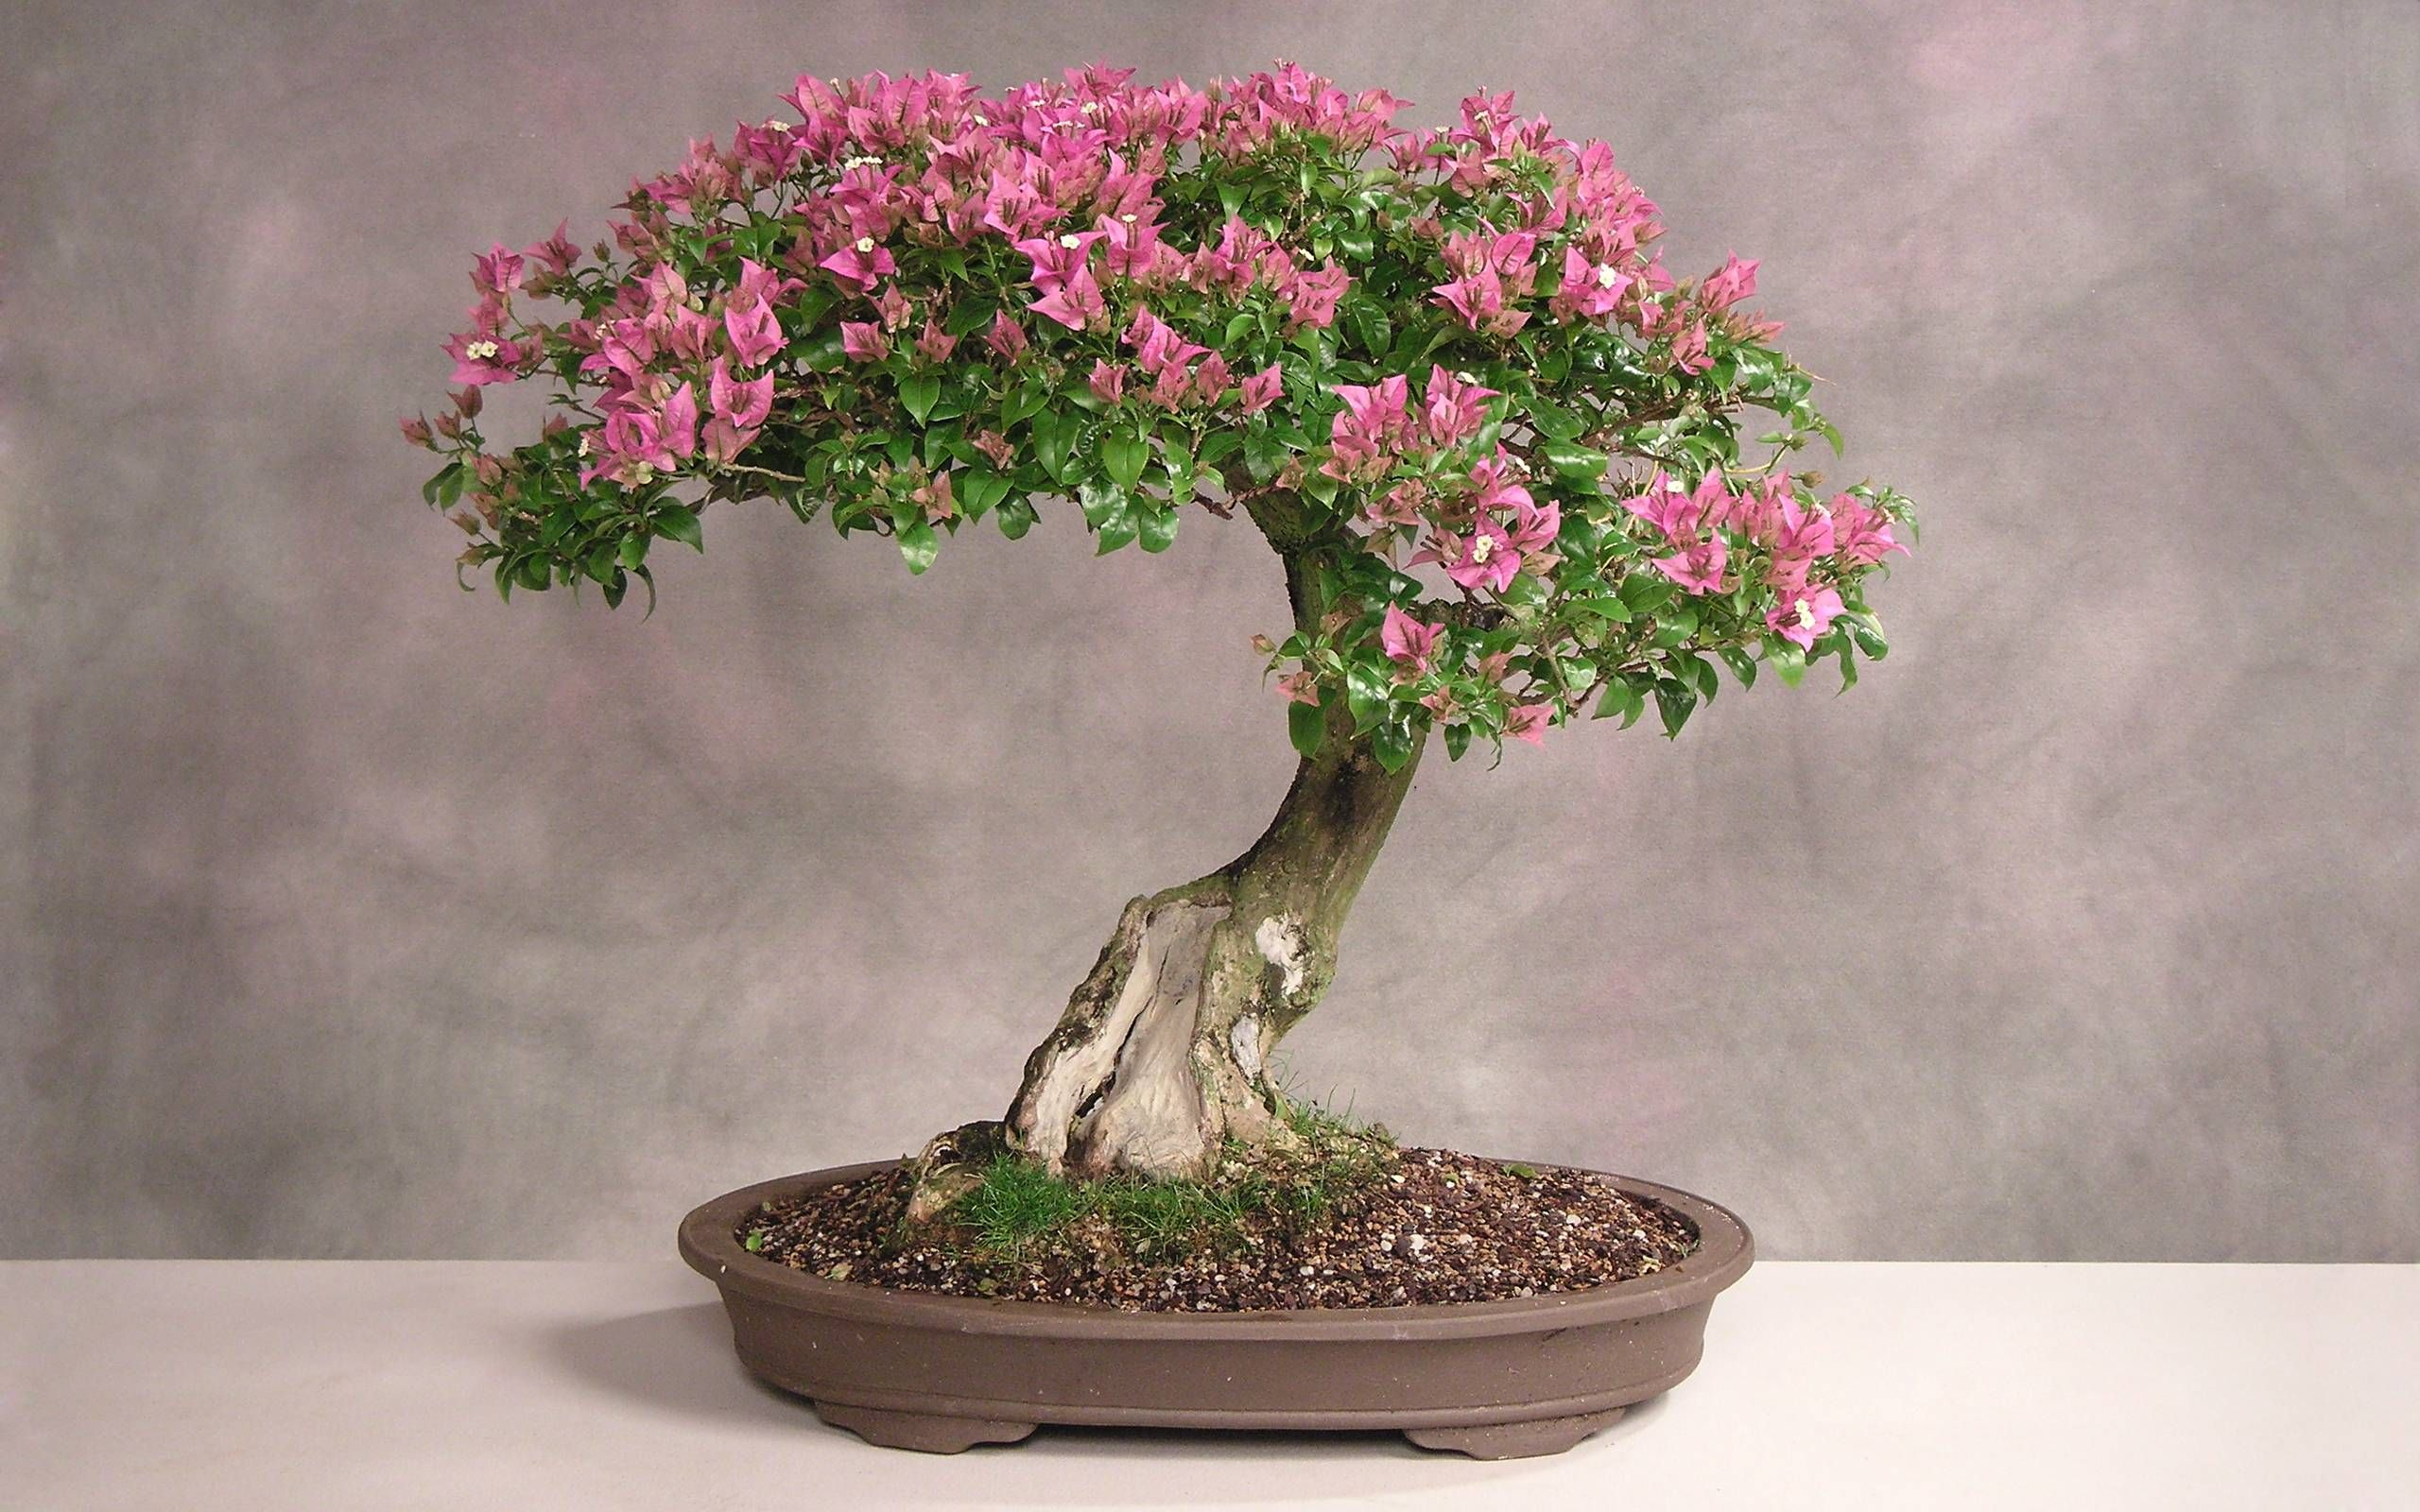 Download Bonsai Wallpaper 1600x1200 Wallpoper Bougainvillea Bonsai Cherry Blossom Bonsai Tree Bonsai Tree Care